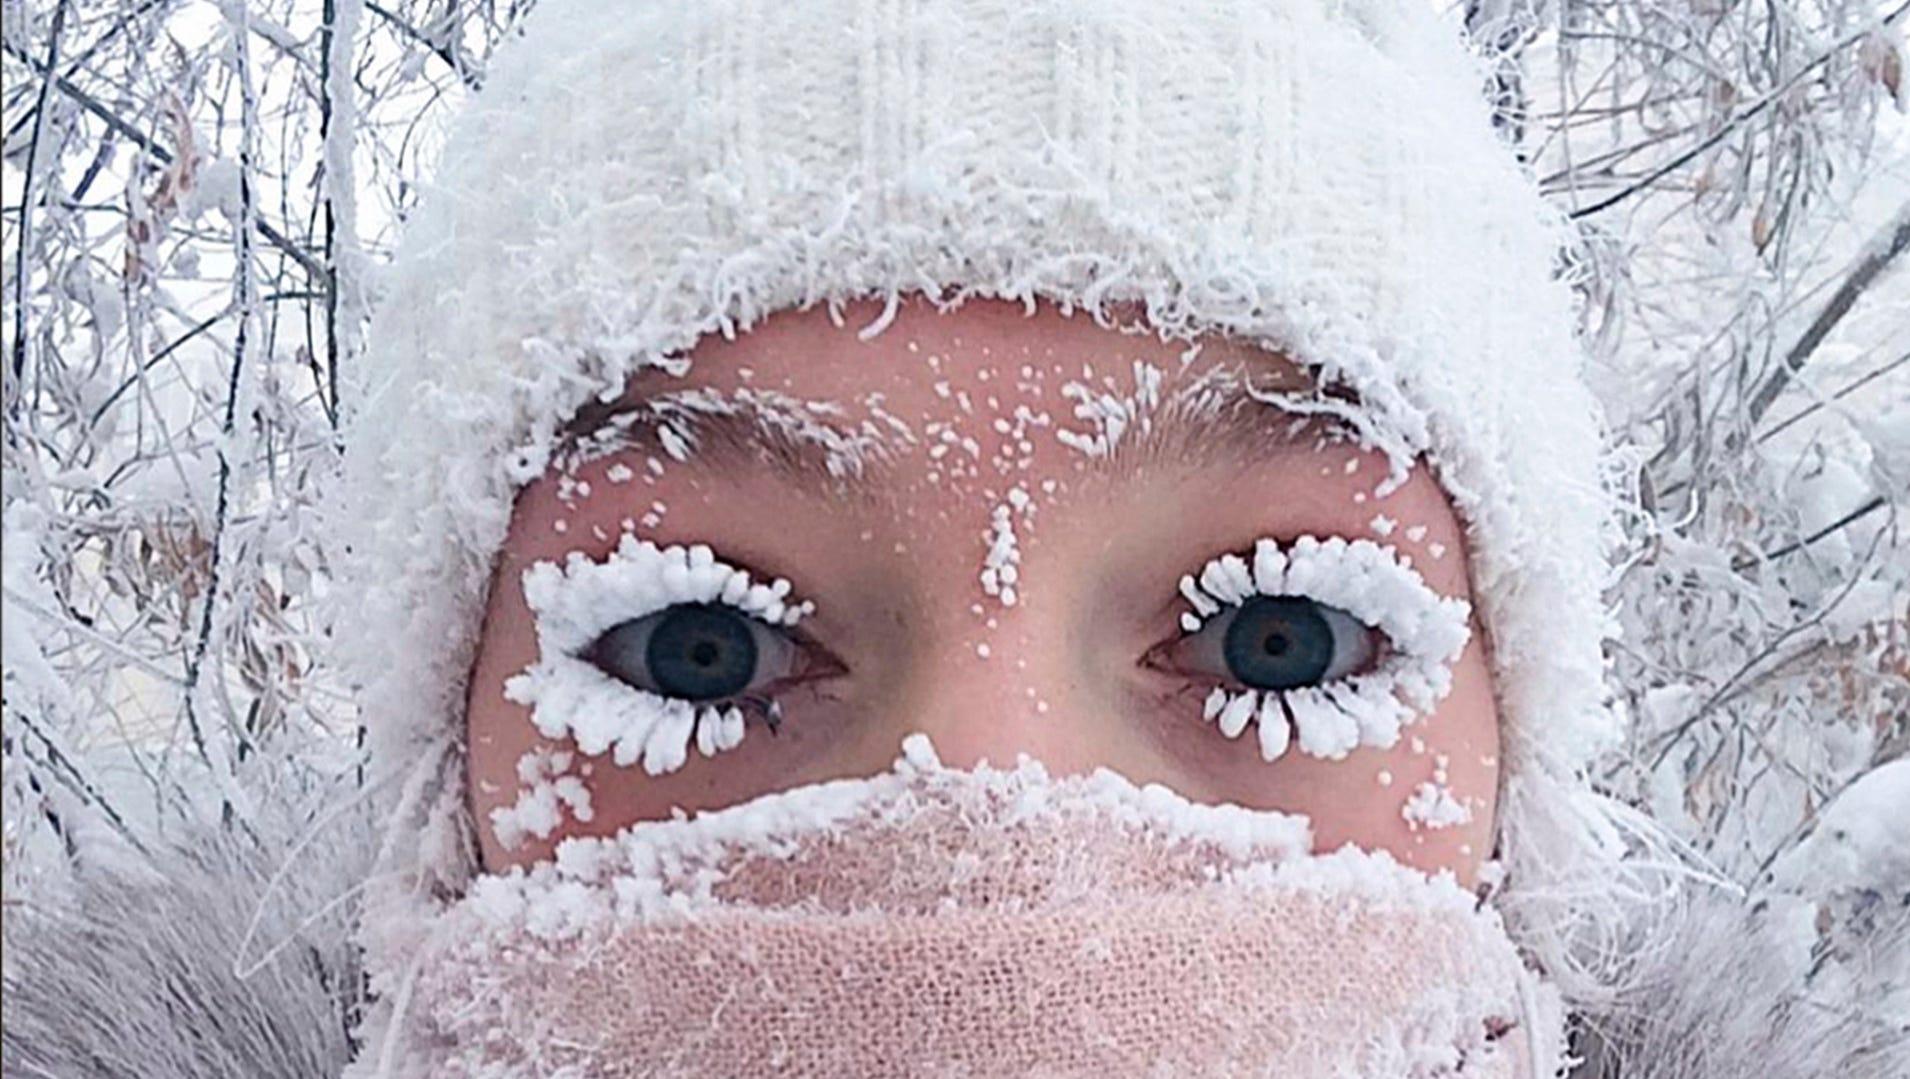 siberia cold  88 below zero is even colder than mars